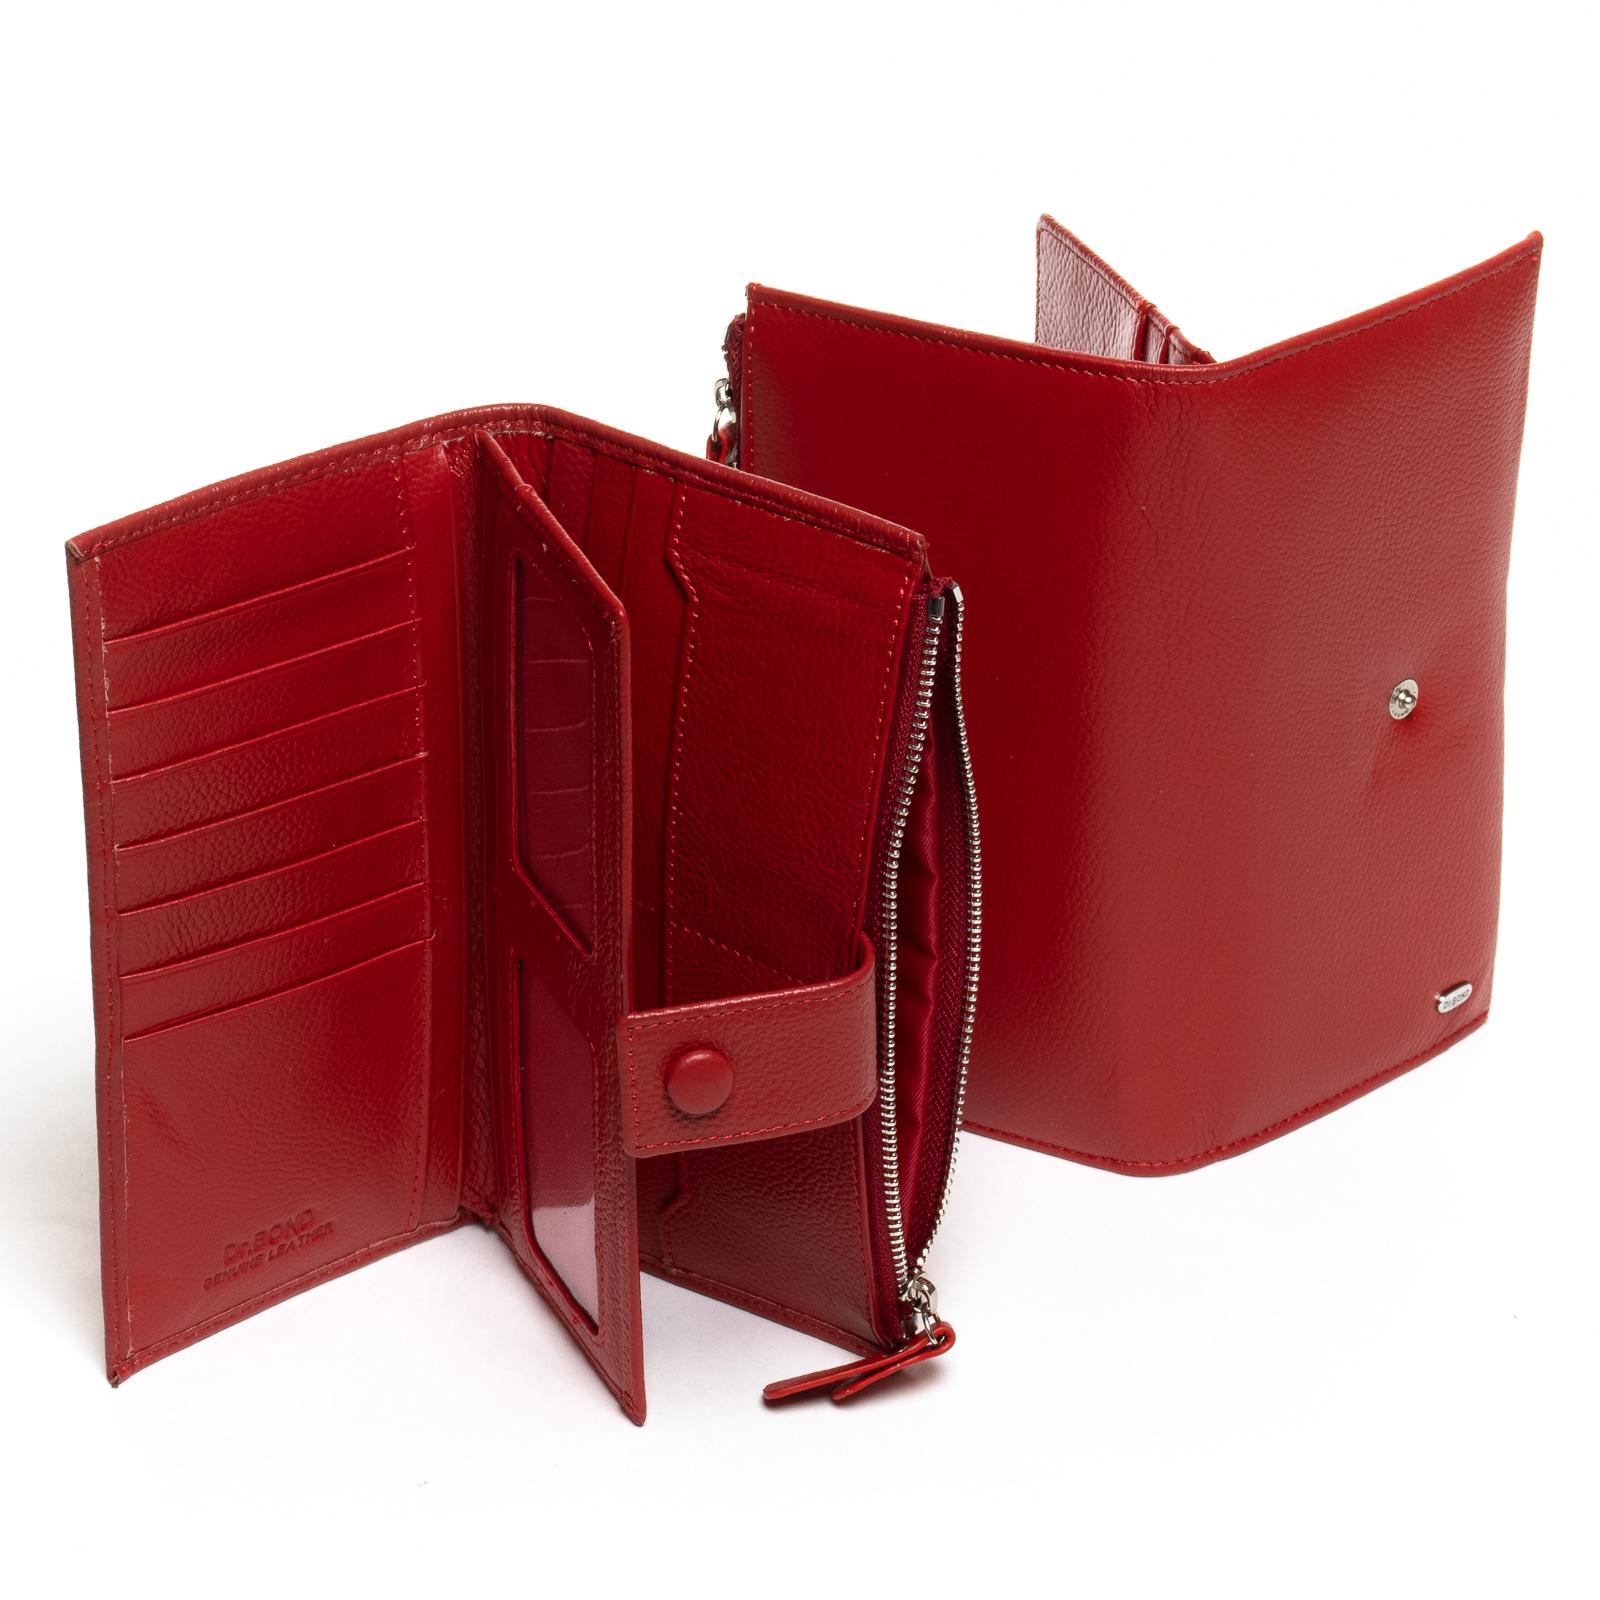 Кошелек Classic кожа DR. BOND WMB-1 red - фото 3